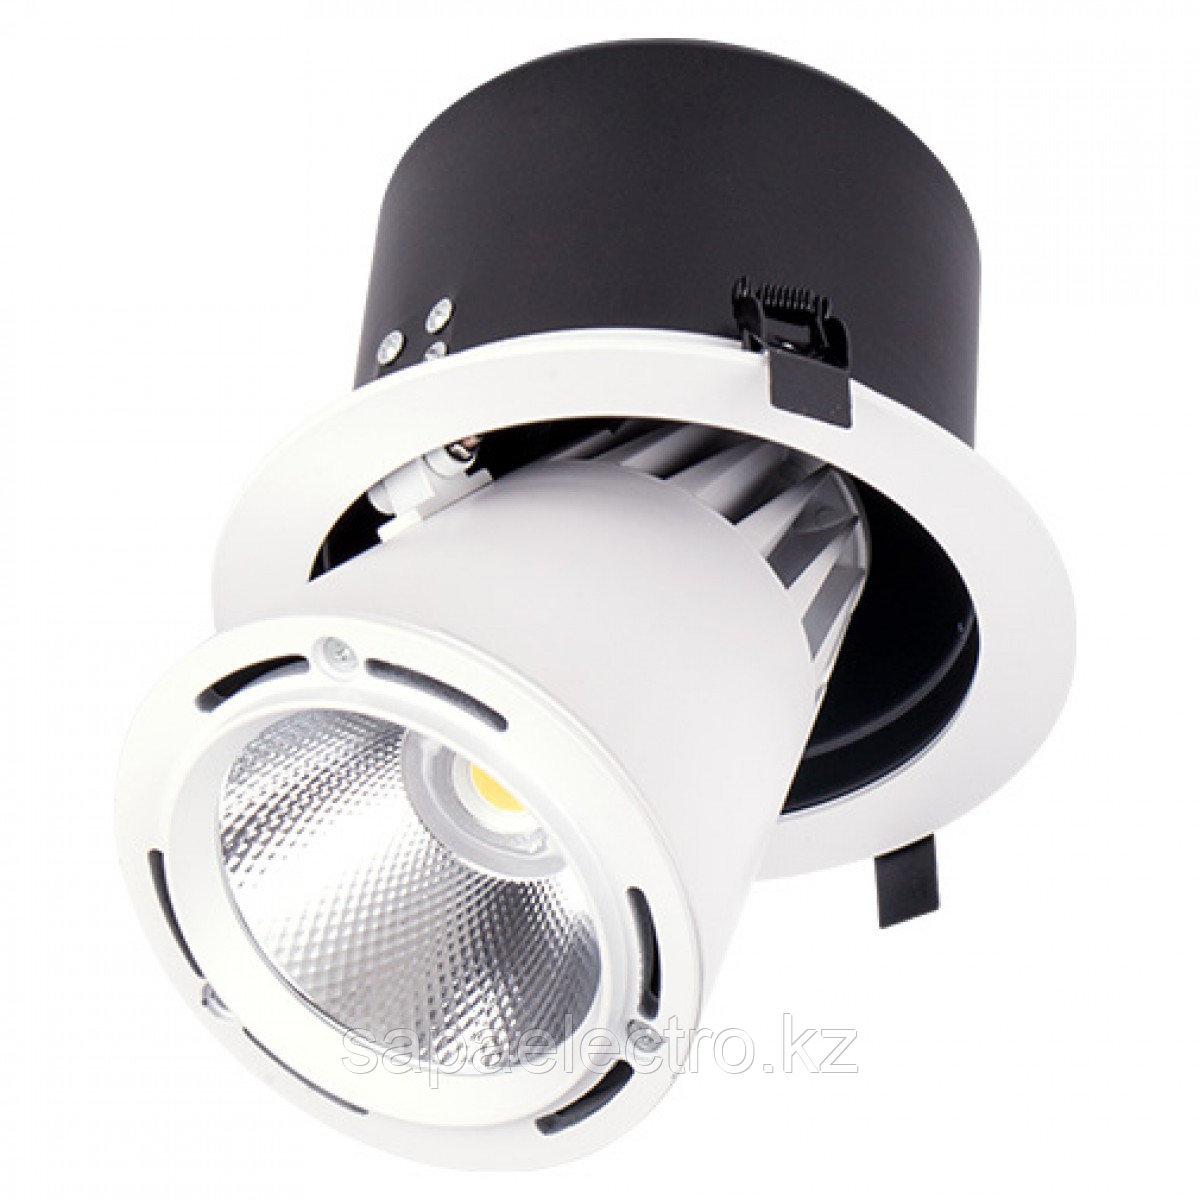 Свет-к  DOWNLIGHT LED LS-DK908 40W WHITE 5700K(TS)8